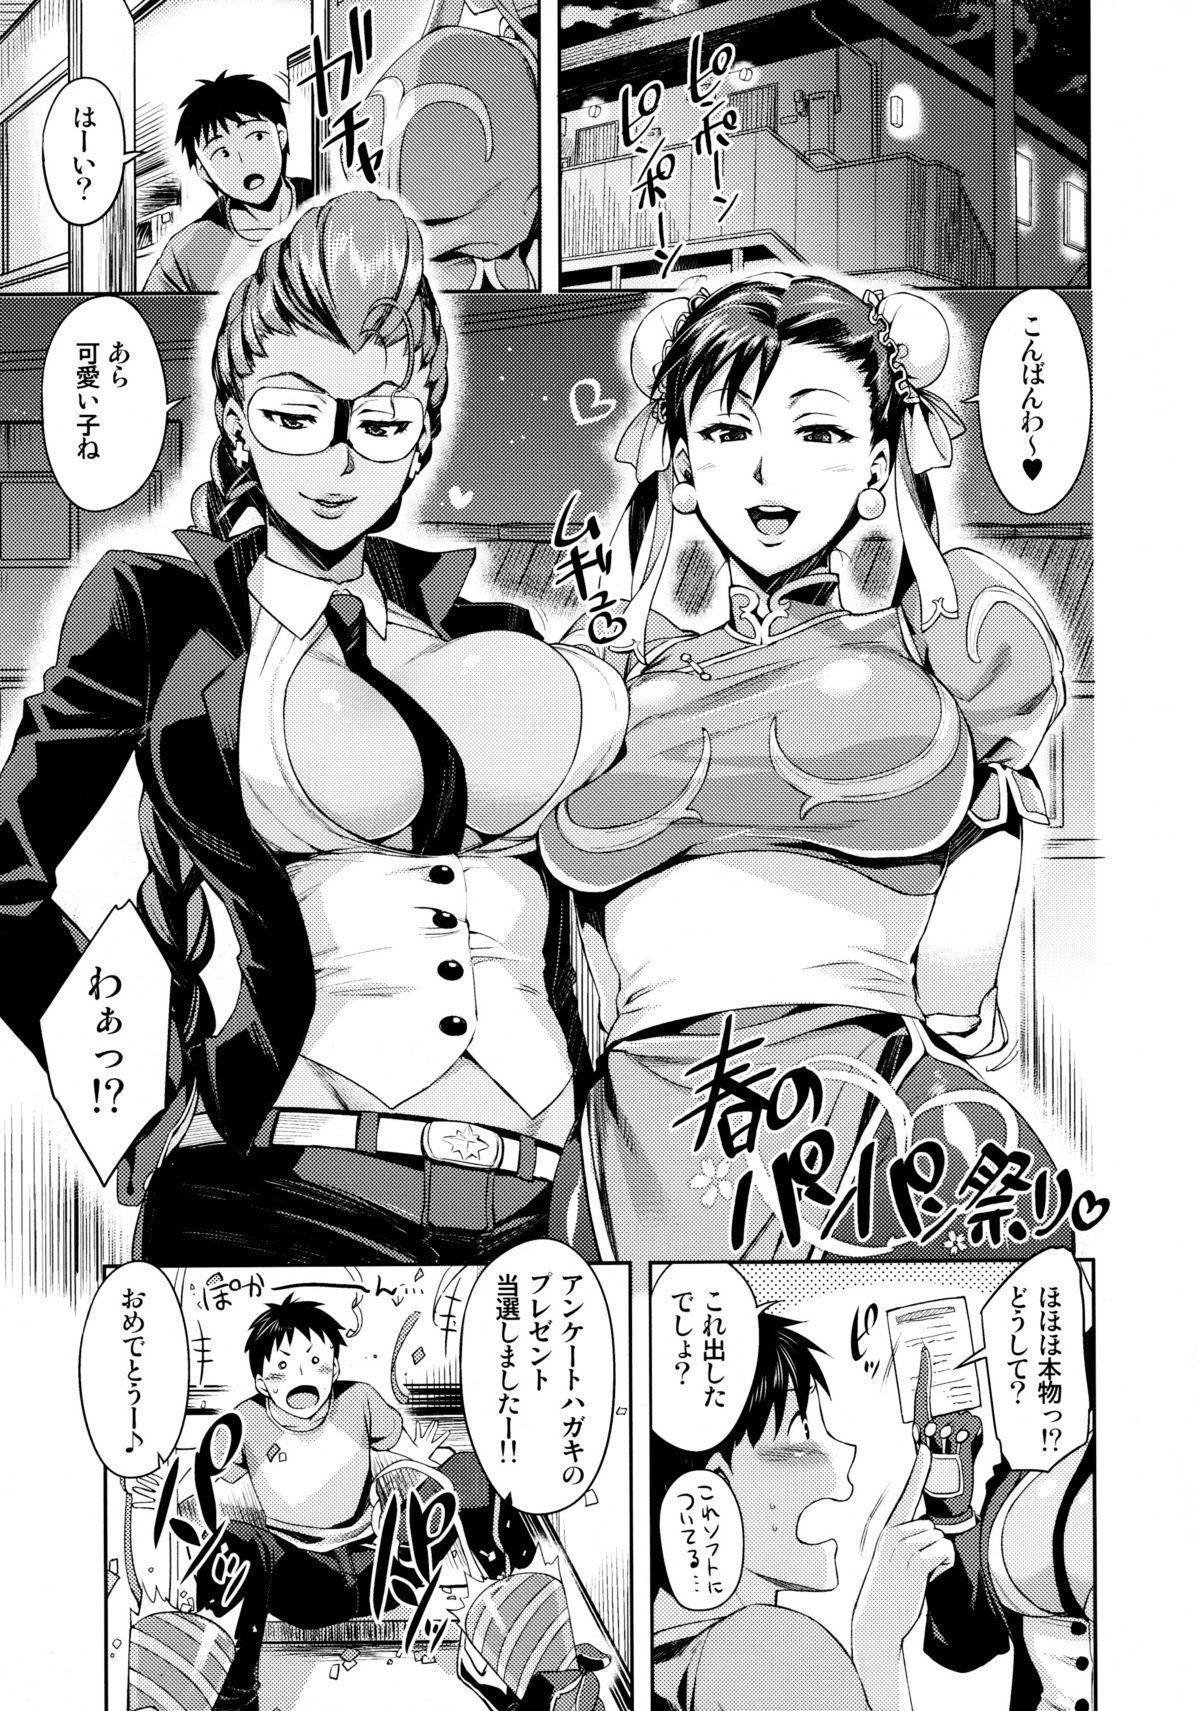 (COMIC1☆5) [ReDrop (Miyamoto Smoke, Otsumami)] Haru no Chun-Li Bon   The Chun-Li Spring Book (Street Fighter) 1